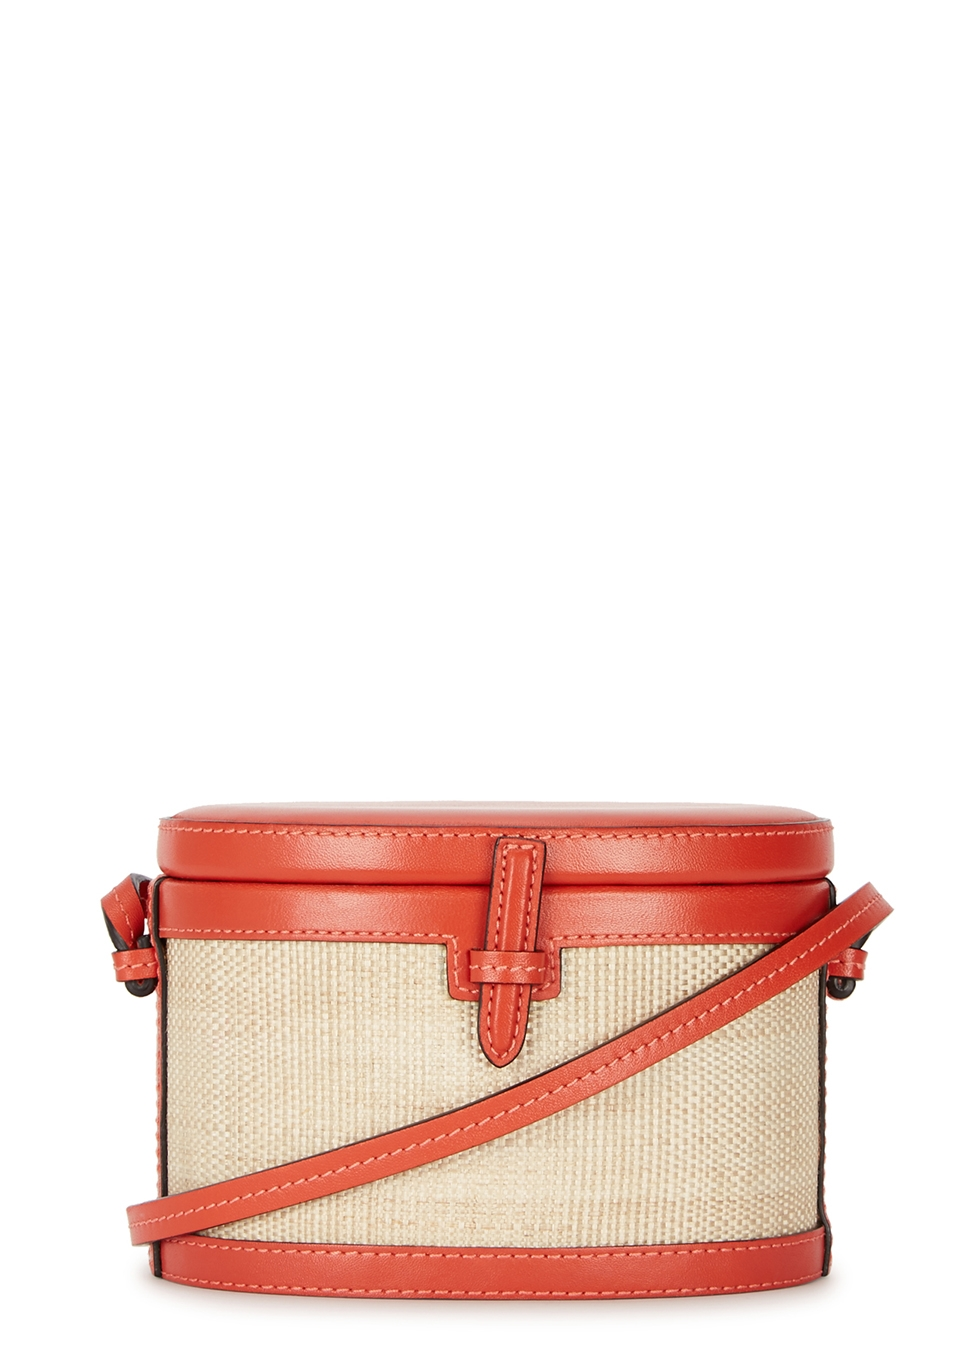 6438588f412 Women s Designer Bags